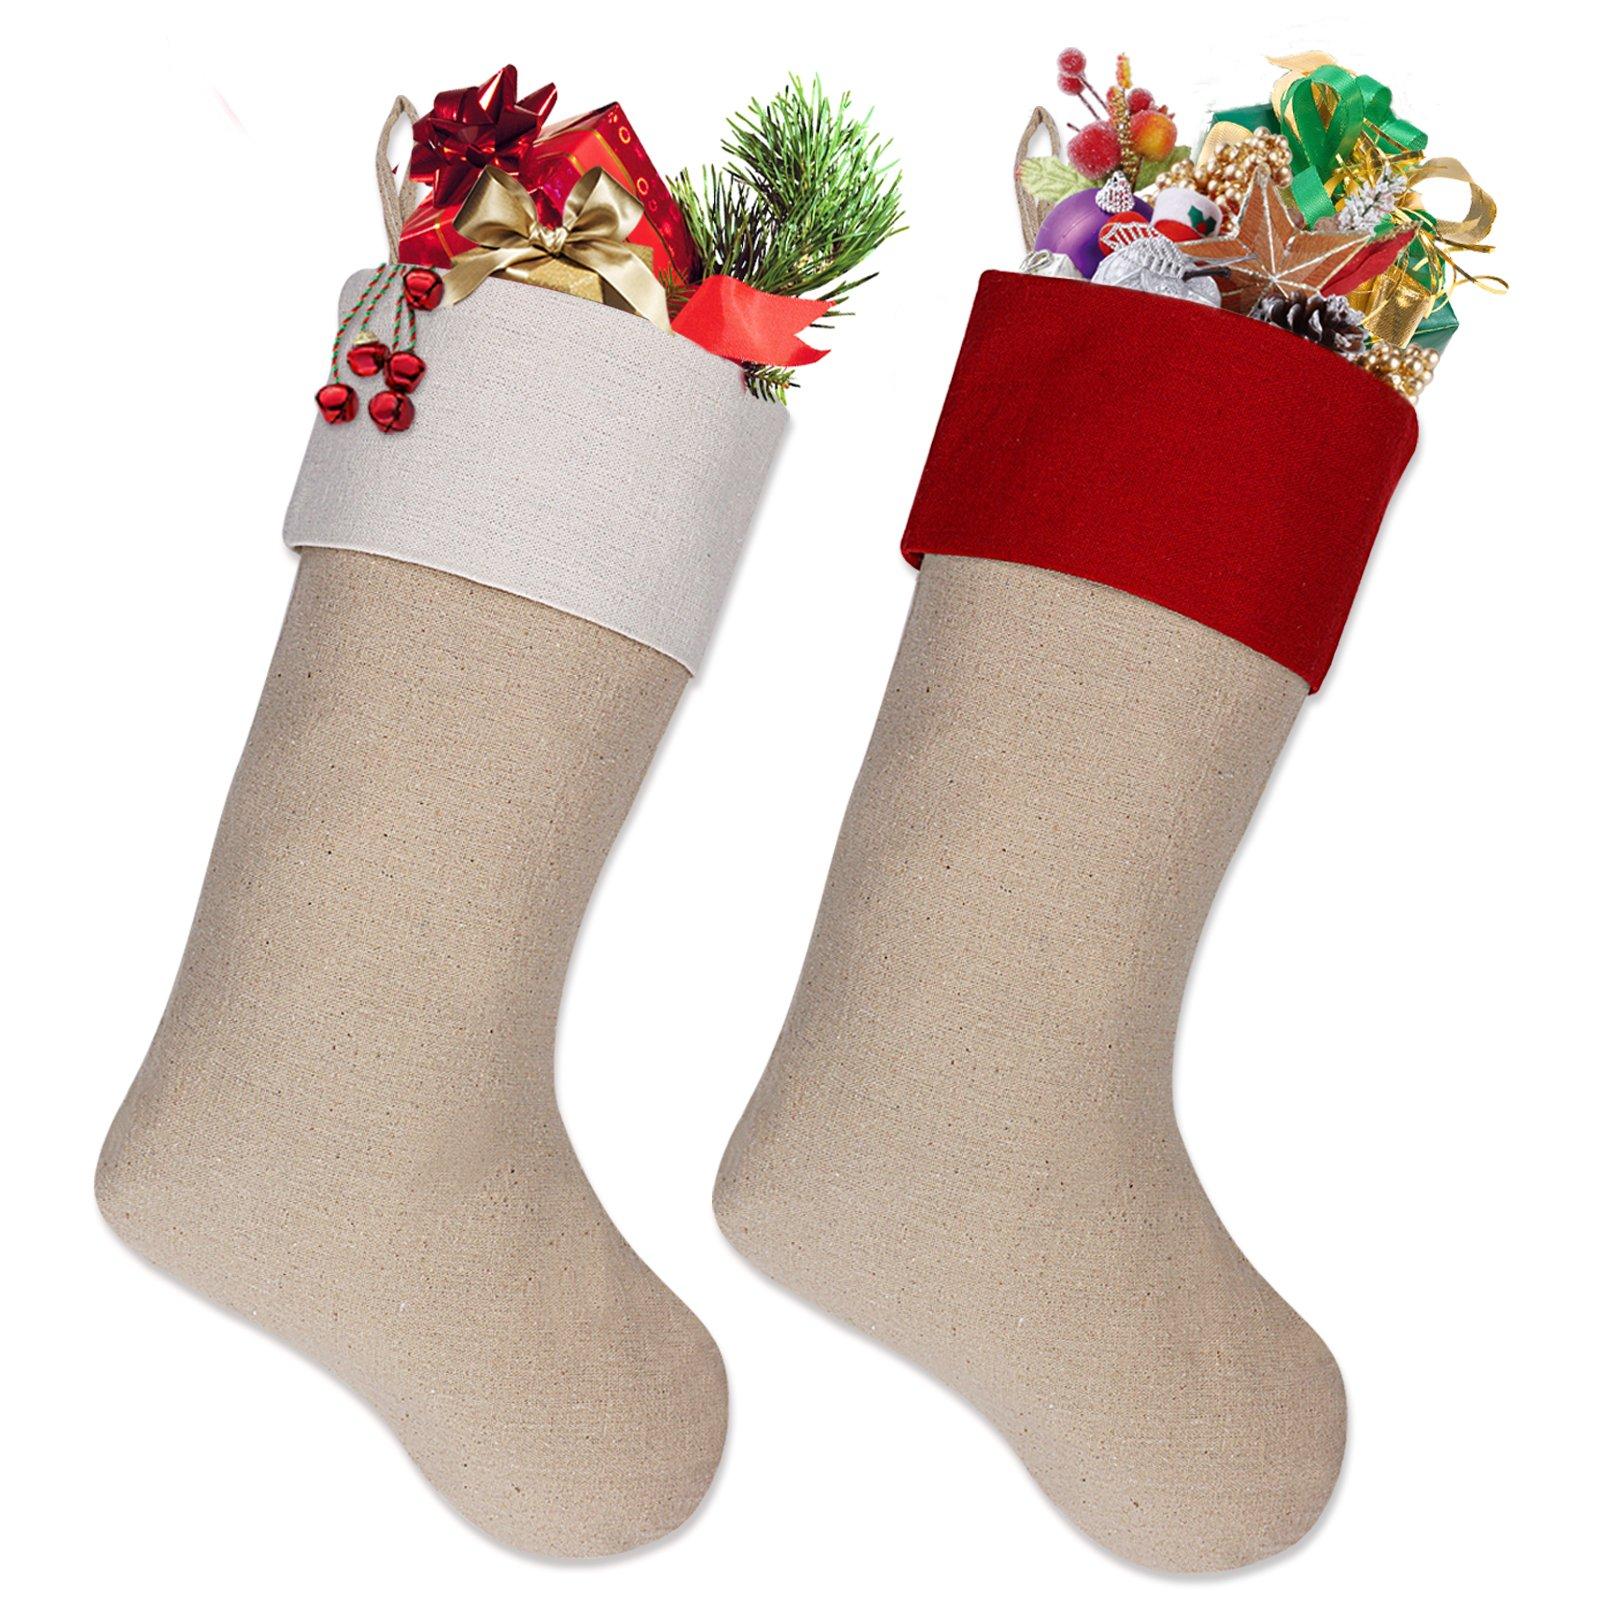 Ivenf 18'' Burlap Personalized Christmas Stockings, Xmas Holiday Decorations 2 Pack